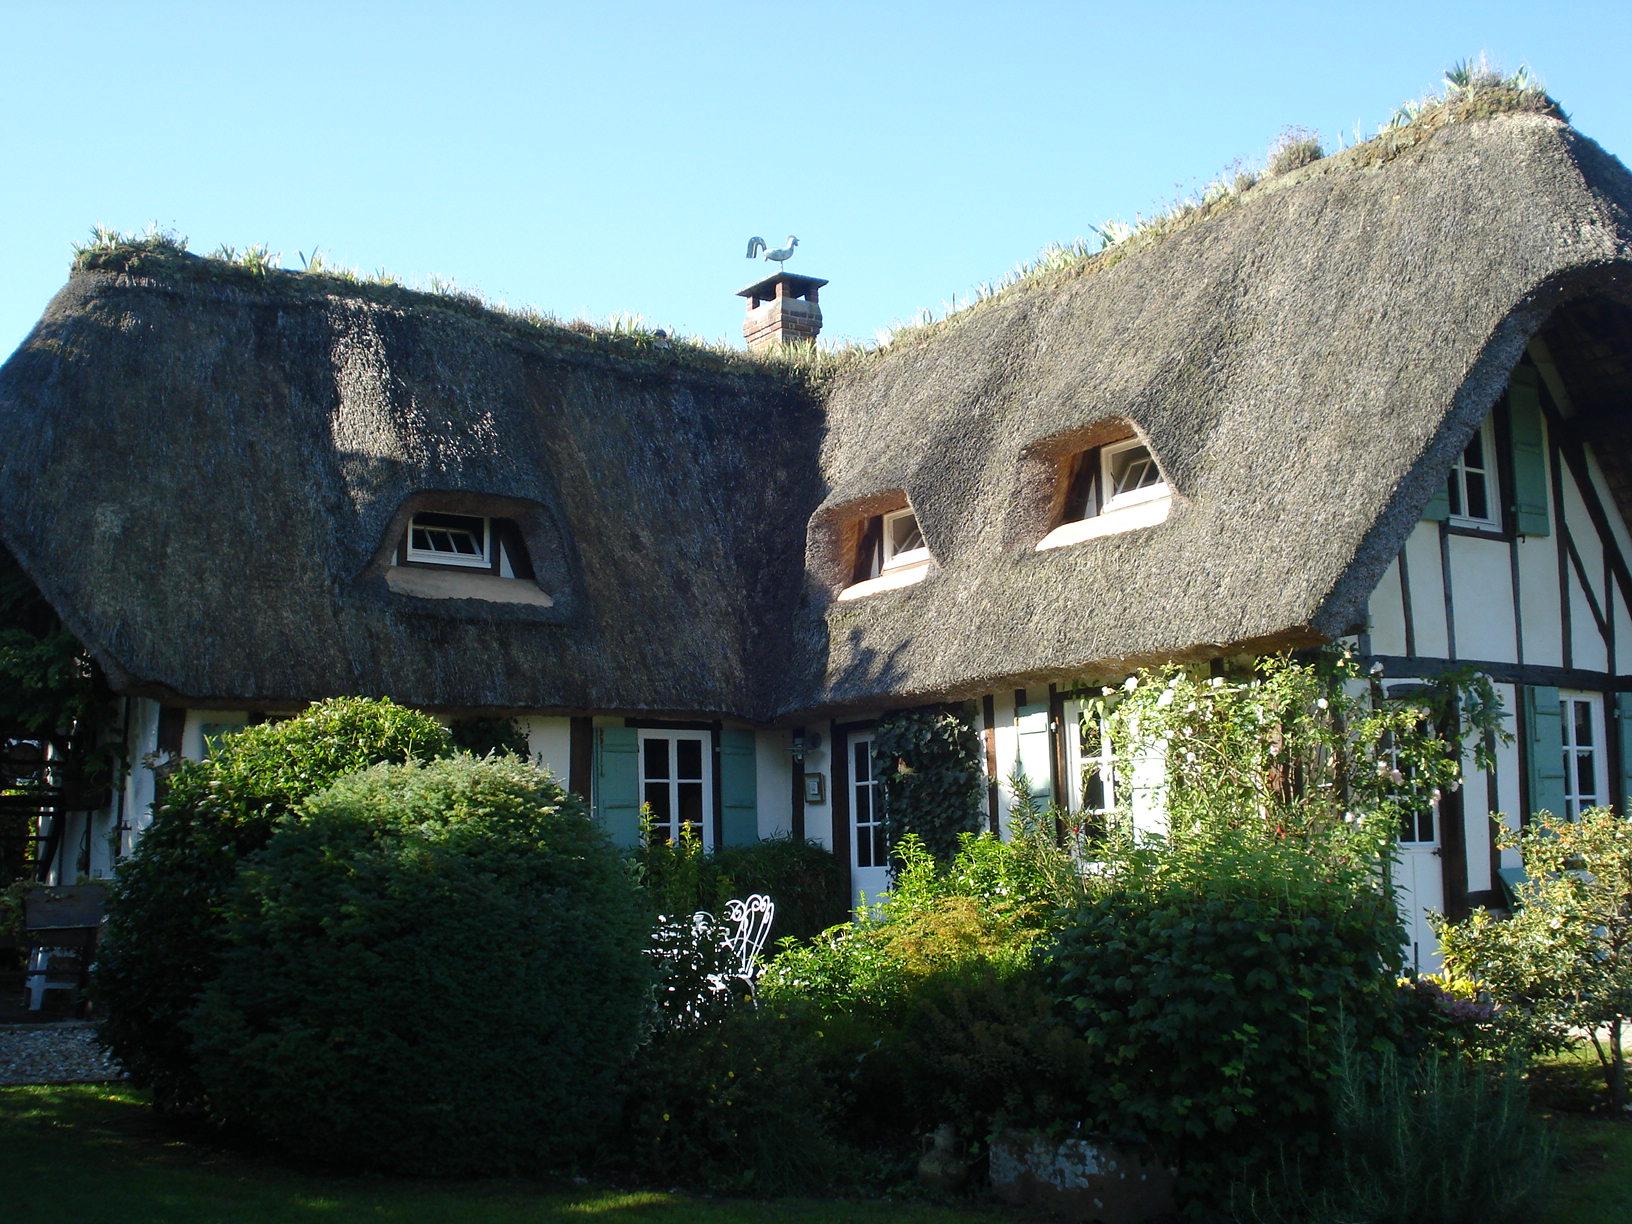 Thatched Cottage Chaumierelesiris